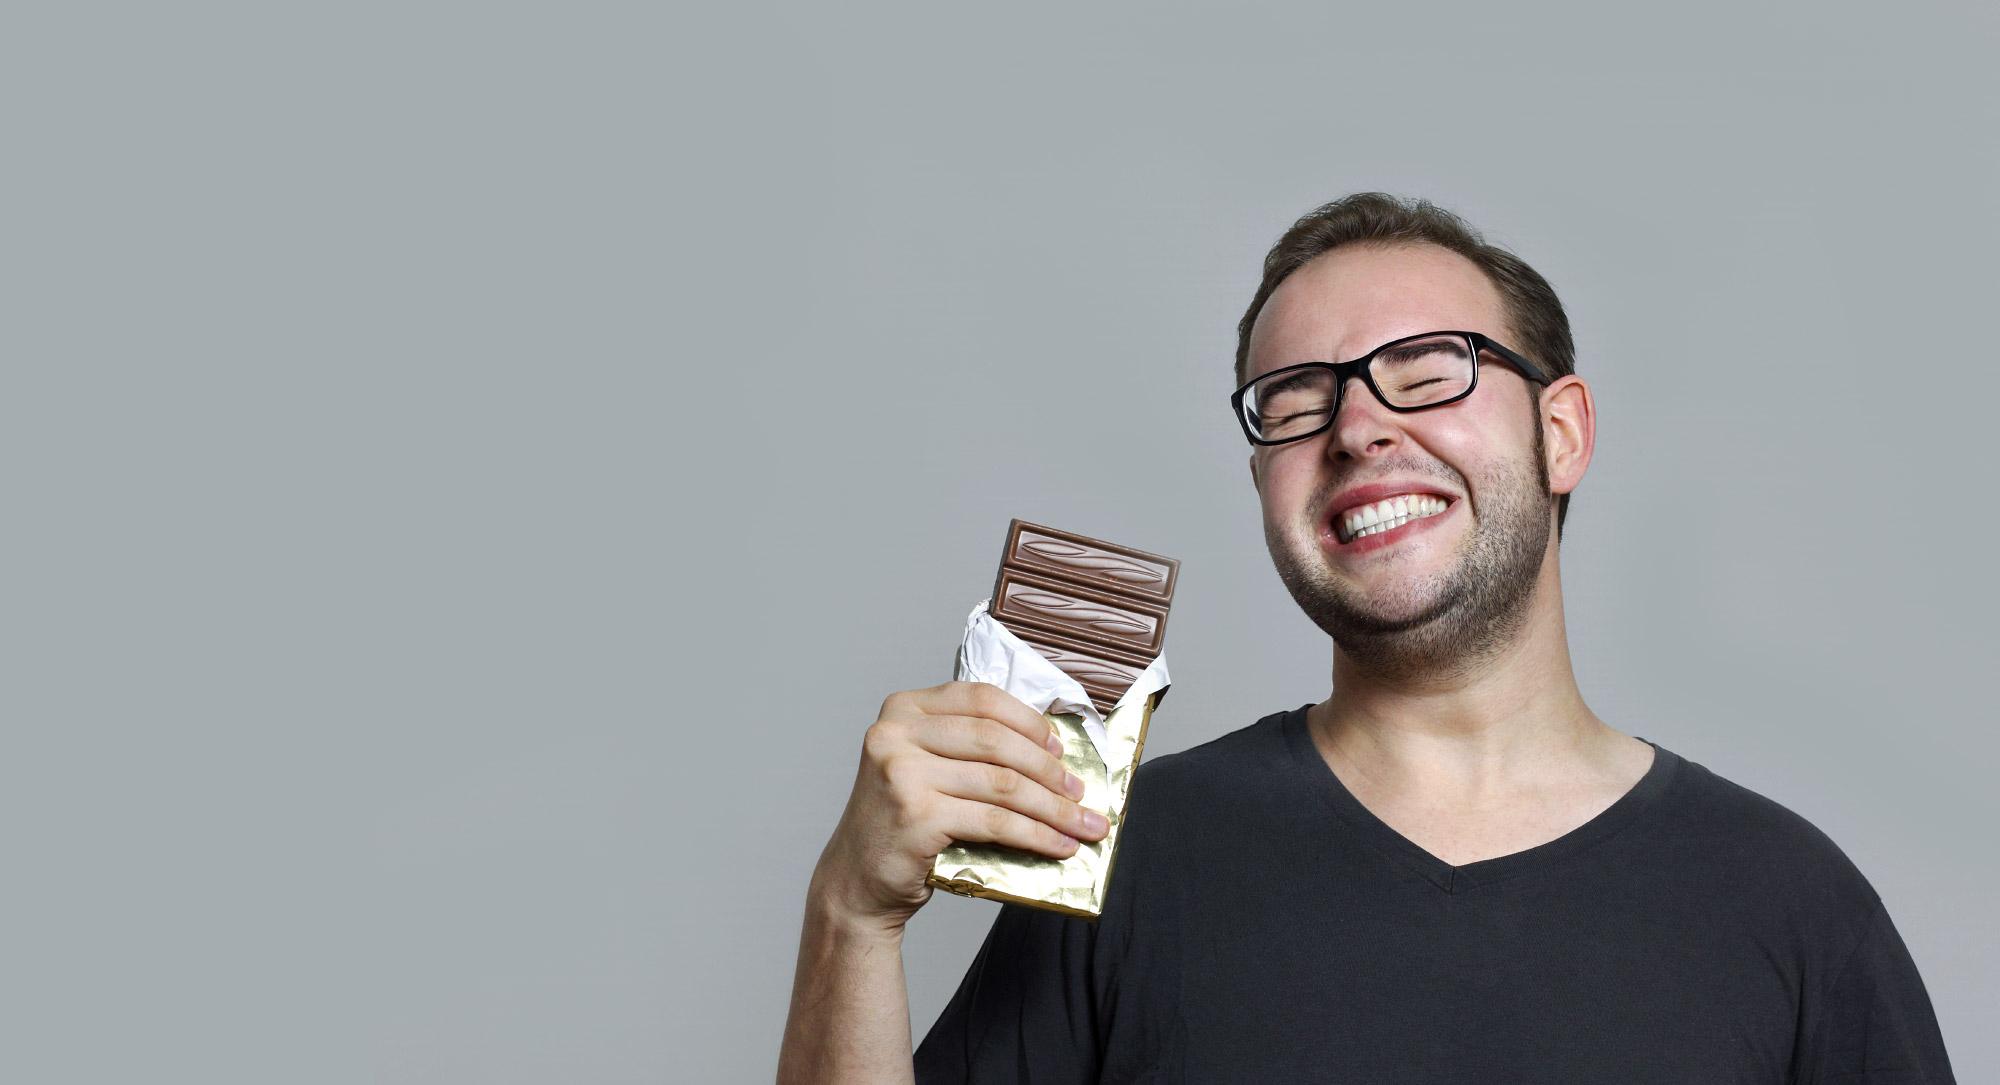 Польза шоколада для мужчин